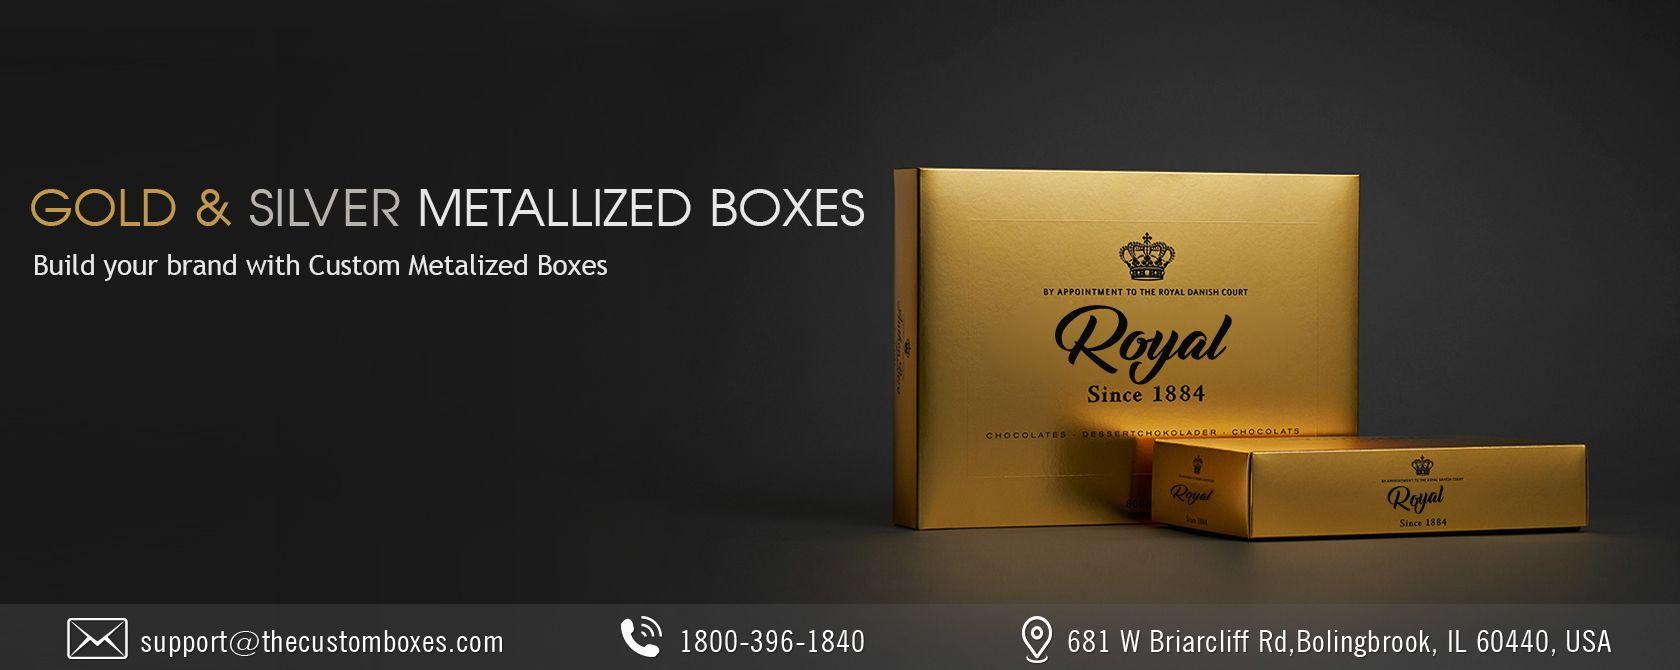 gold-foil-boxes.jpg